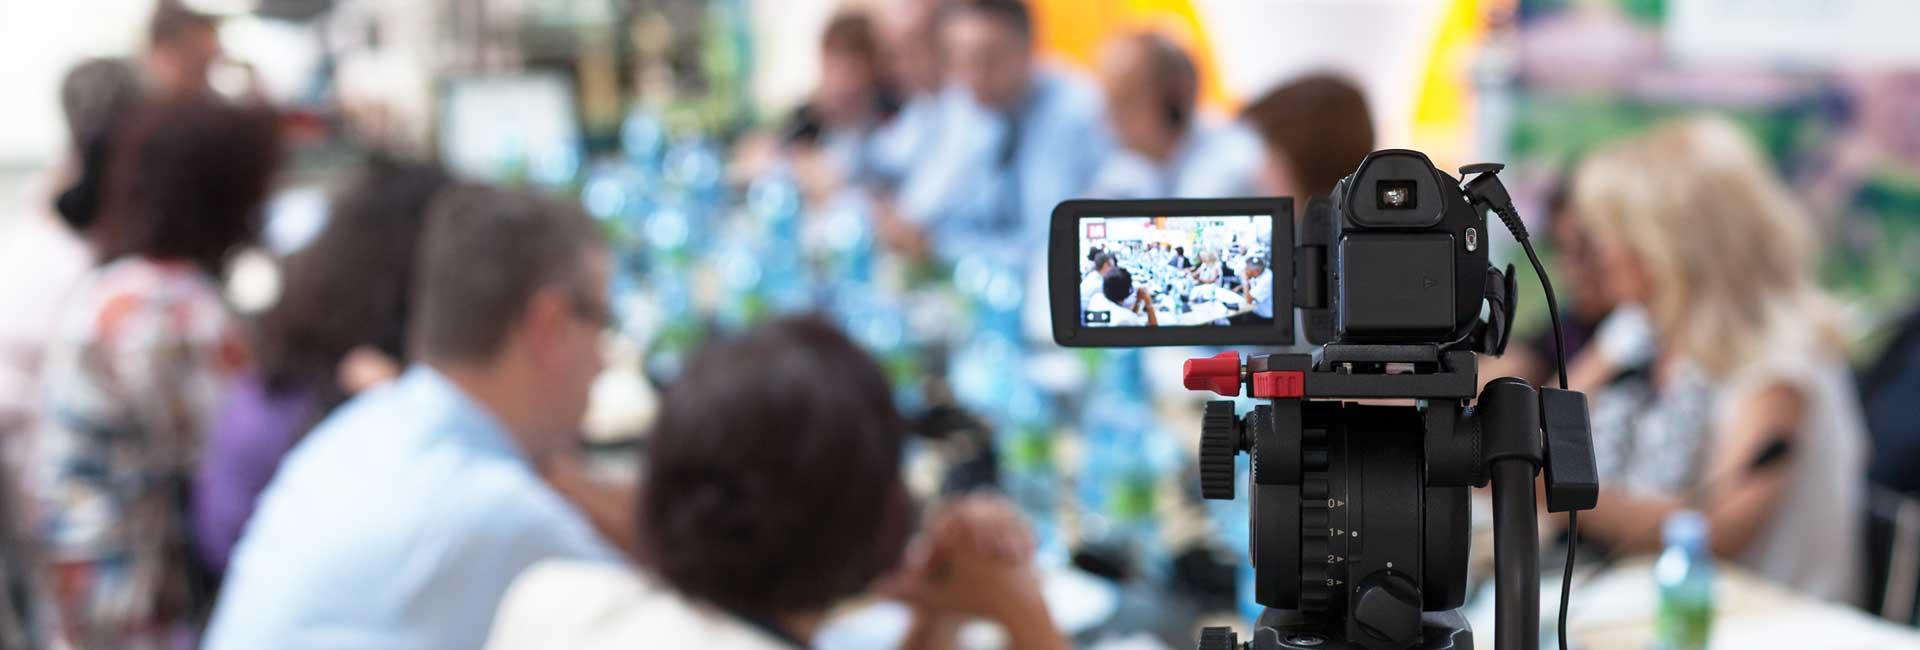 livestream webcast company to stream to youtube live 360